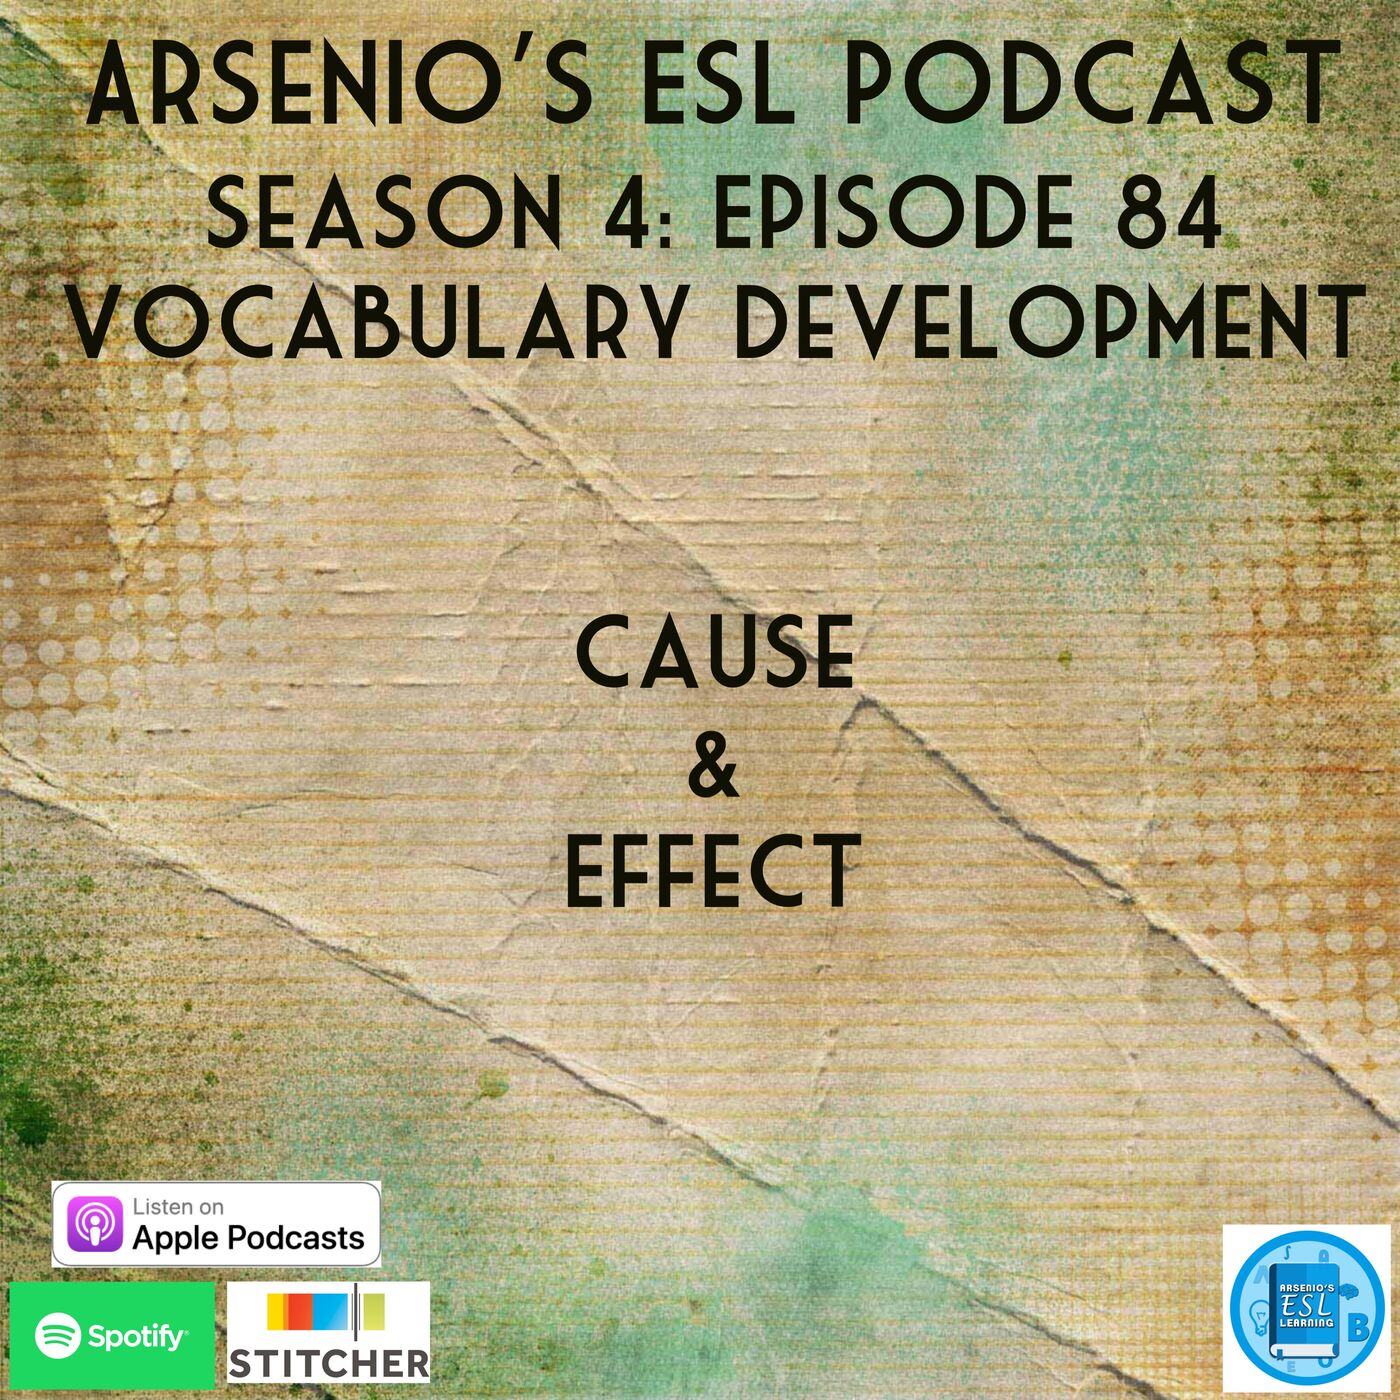 Arsenio's ESL Podcast: Season 4 - Episode 84 - Vocabulary Development - Cause and Effect